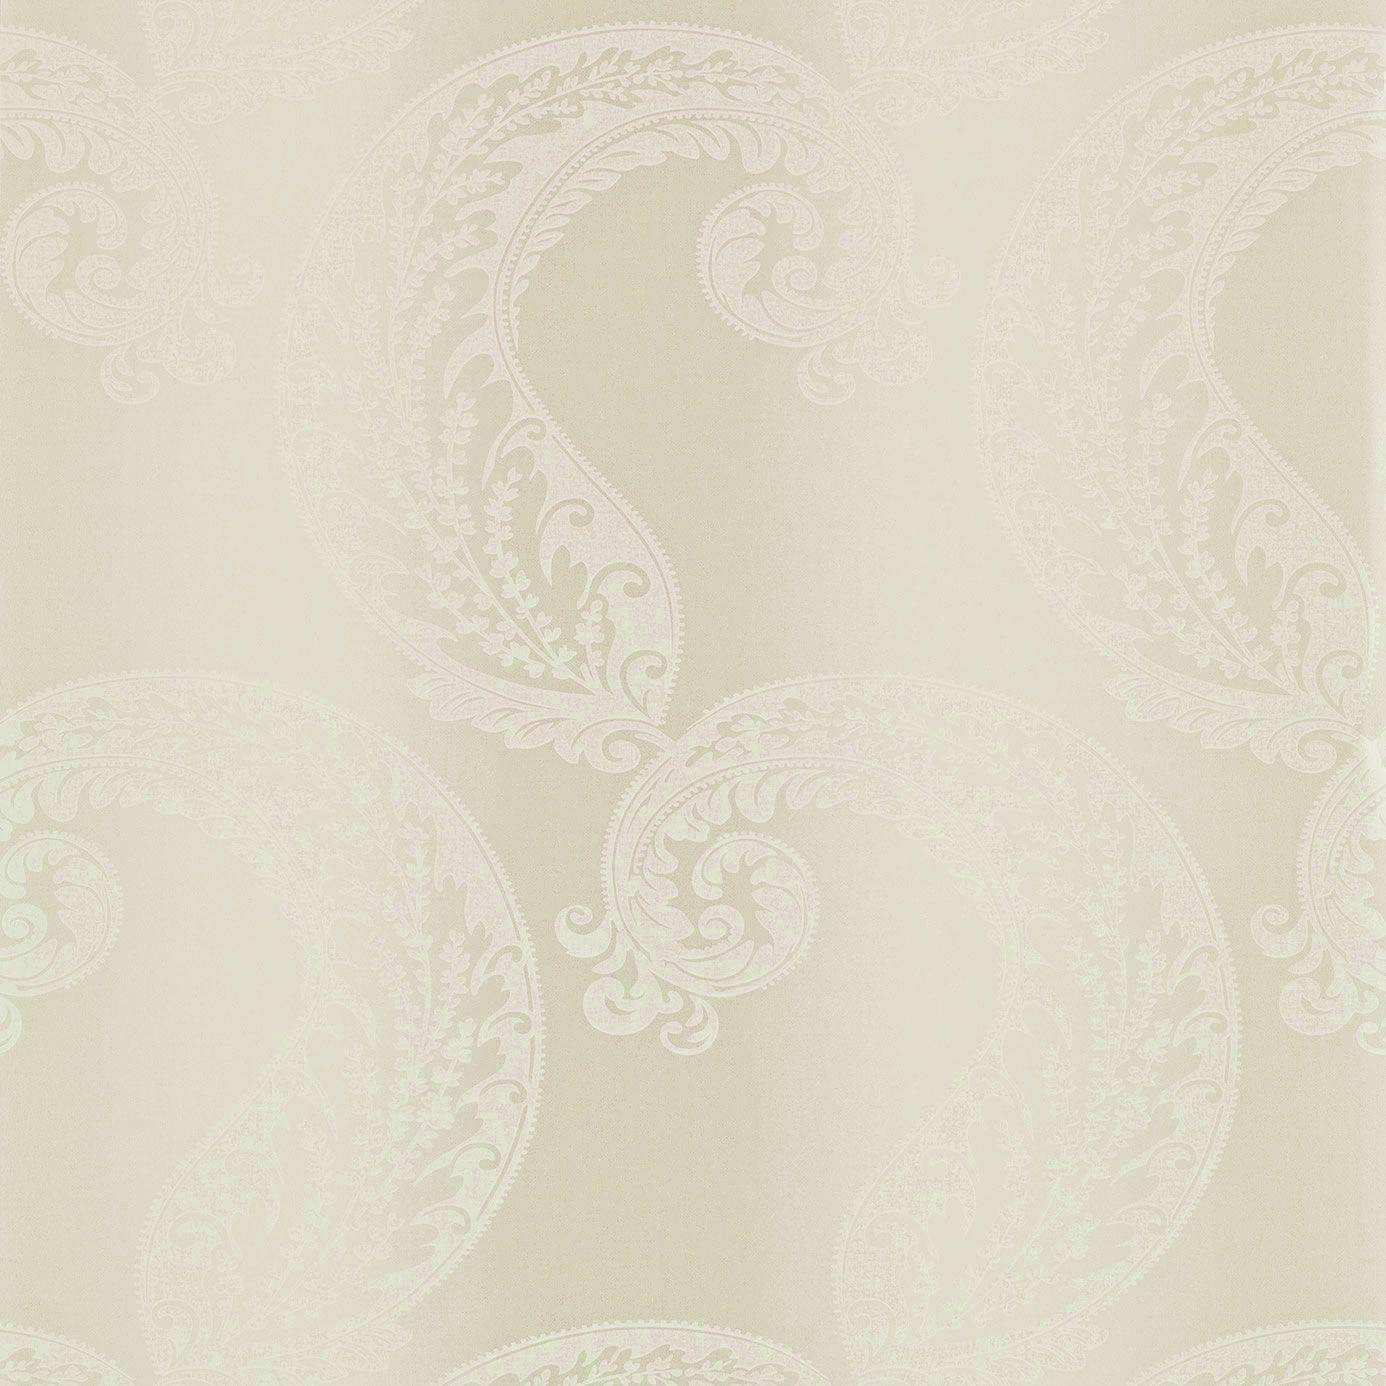 Pearl Opal White   110601   Adella   Leonida   Harlequin Wallpaper 1386x1386